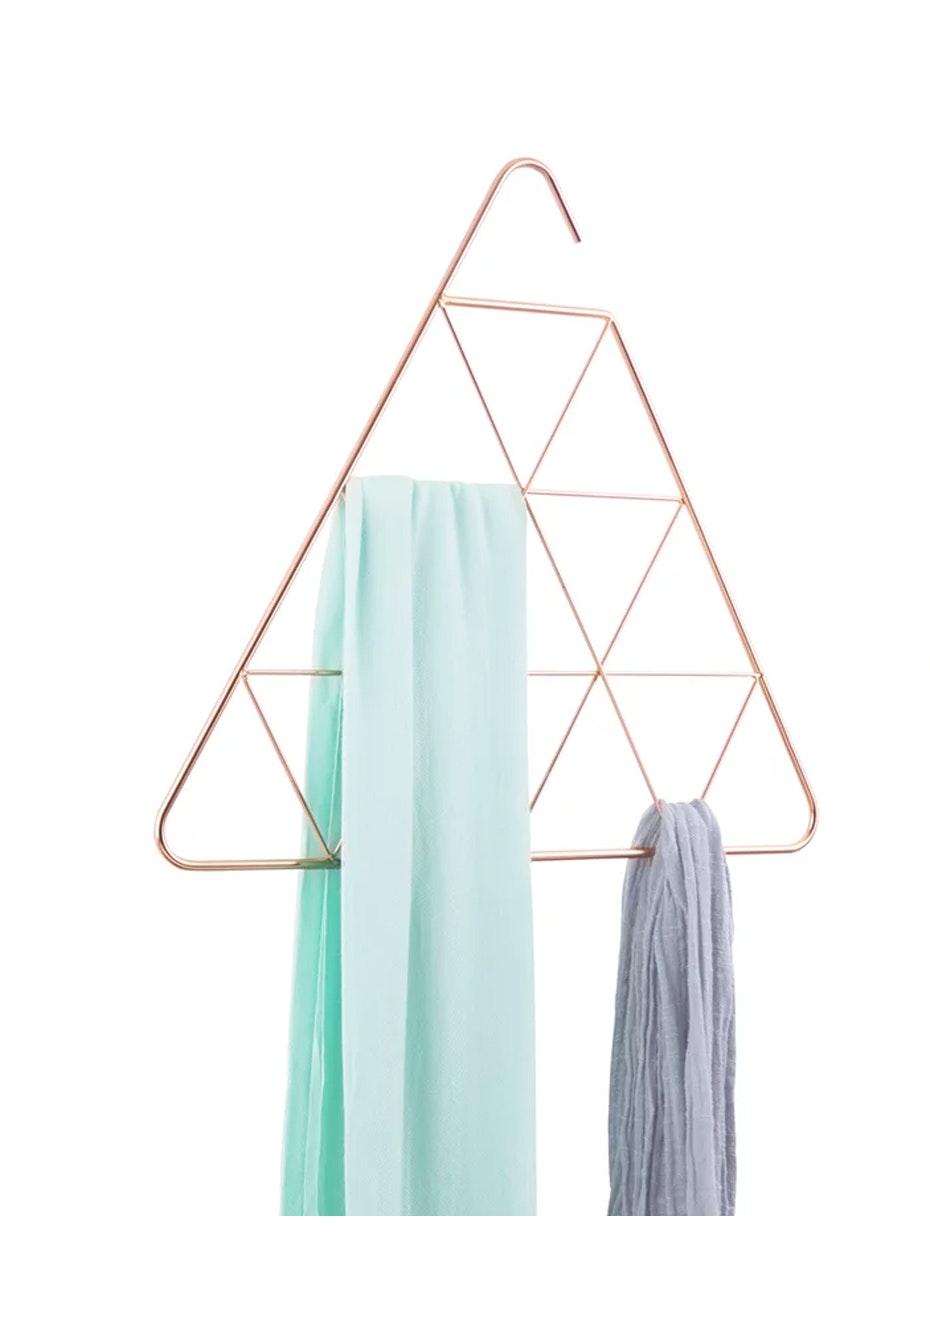 Umbra - Umbra Pendant Scarf Hanger Triangle - Copper